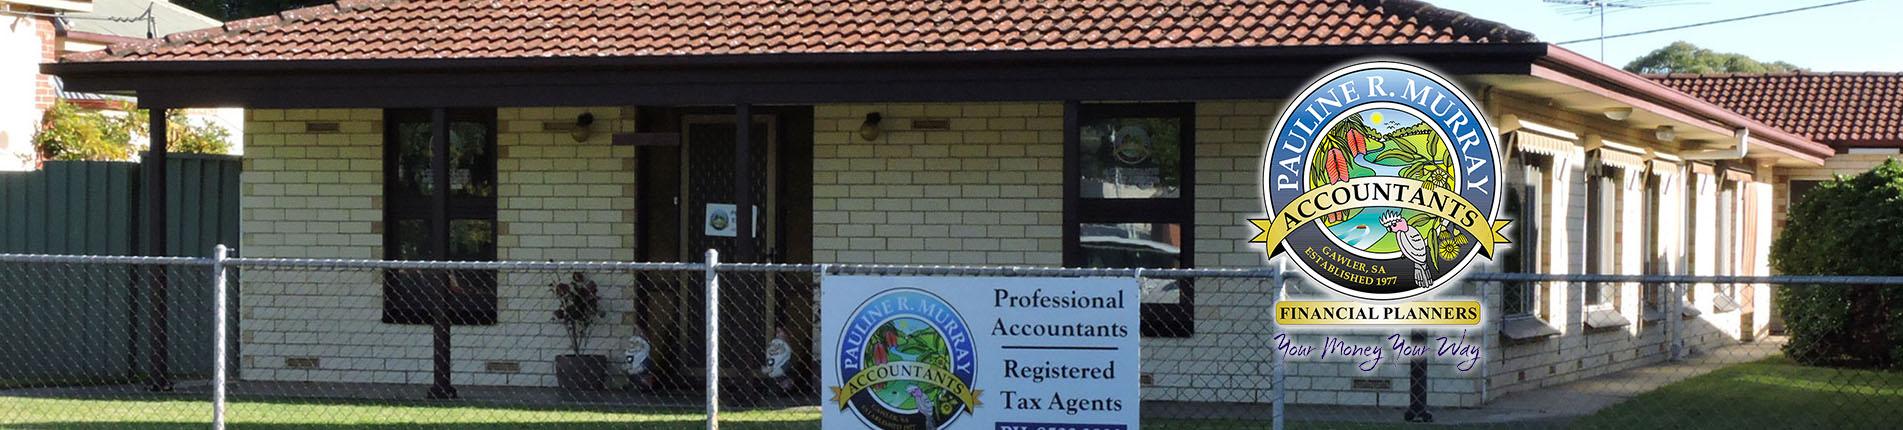 pauline-r-murray-accountant-financial-planner-services-gawler-wallaroo-murray-bridge-pt-pirie-3